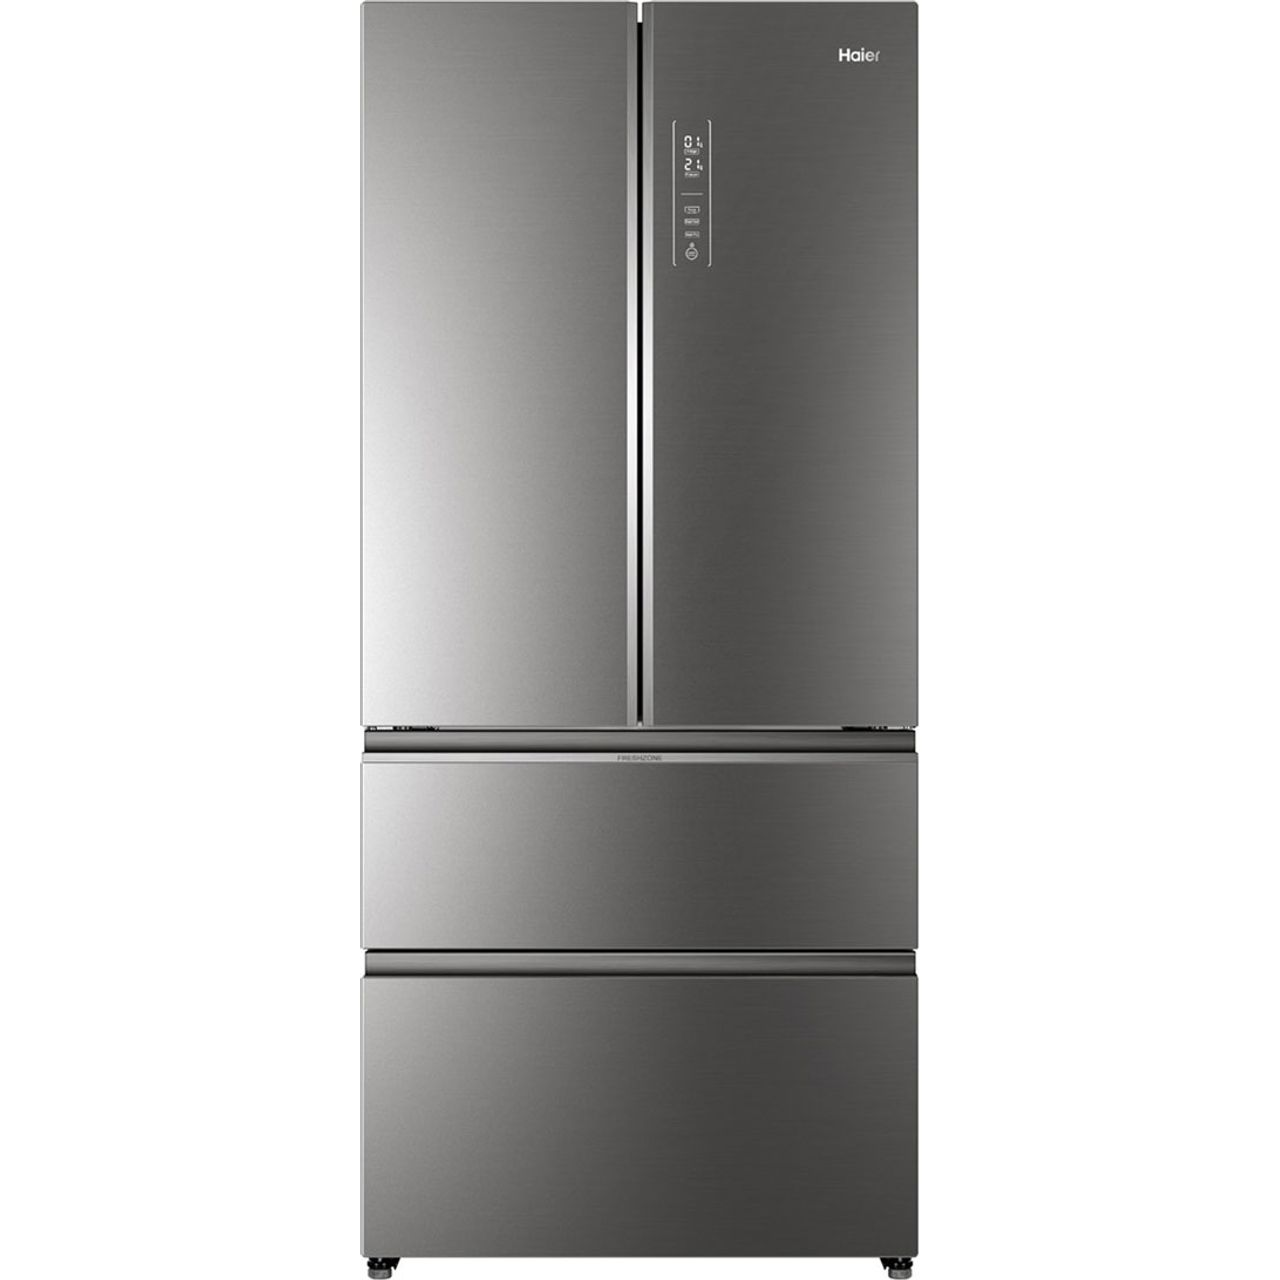 Side By Side Kühlschrank Preis Leistungssieger : Side by side kühlschrank preisvergleich u die besten angebote